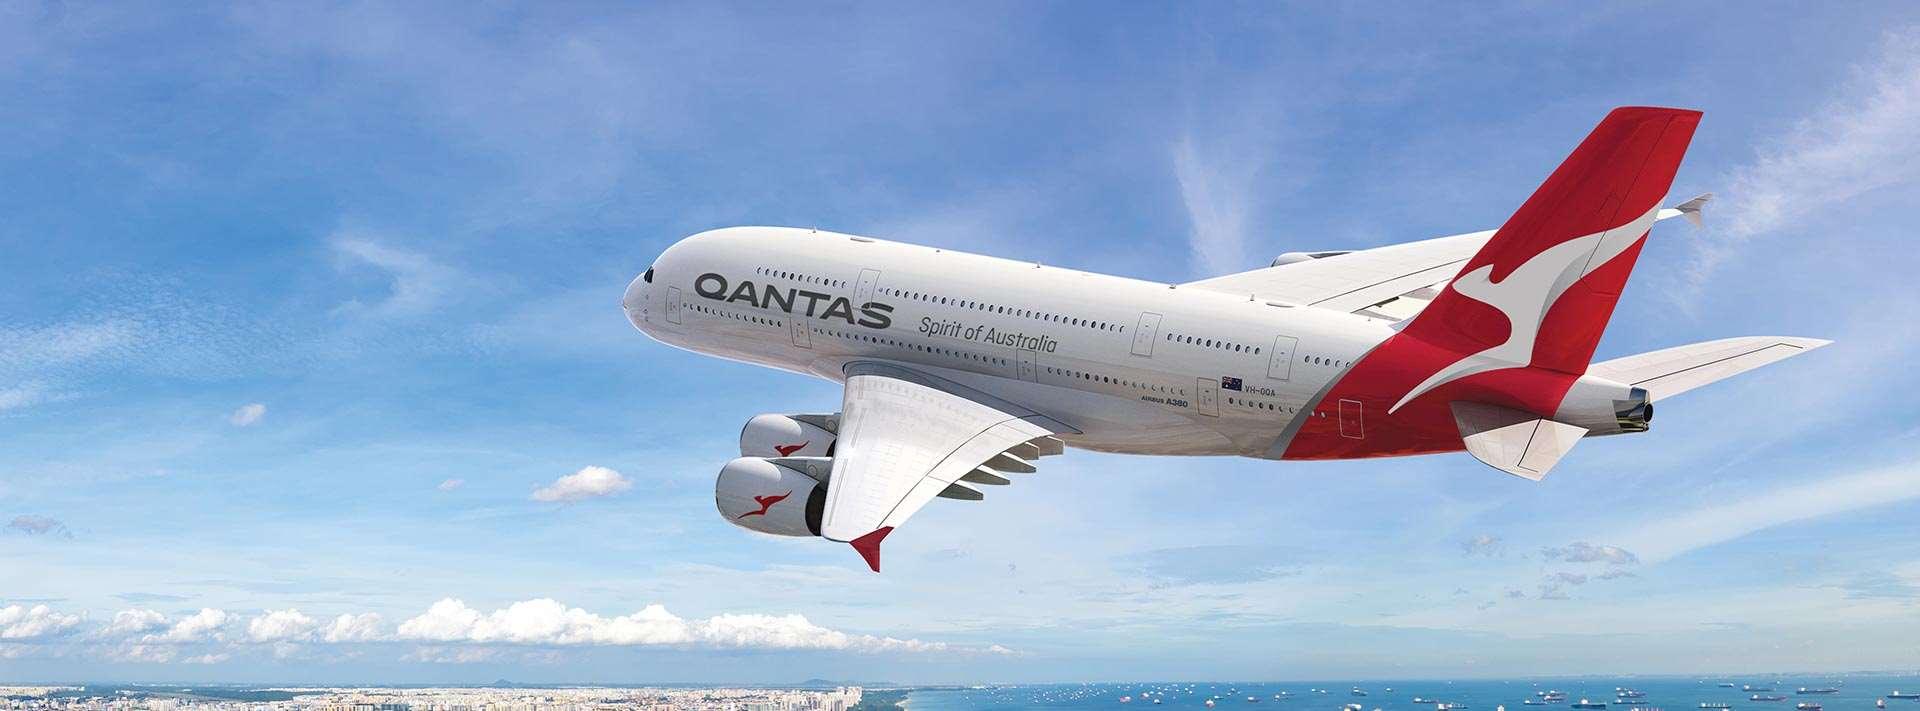 Qantas flights   Netflights